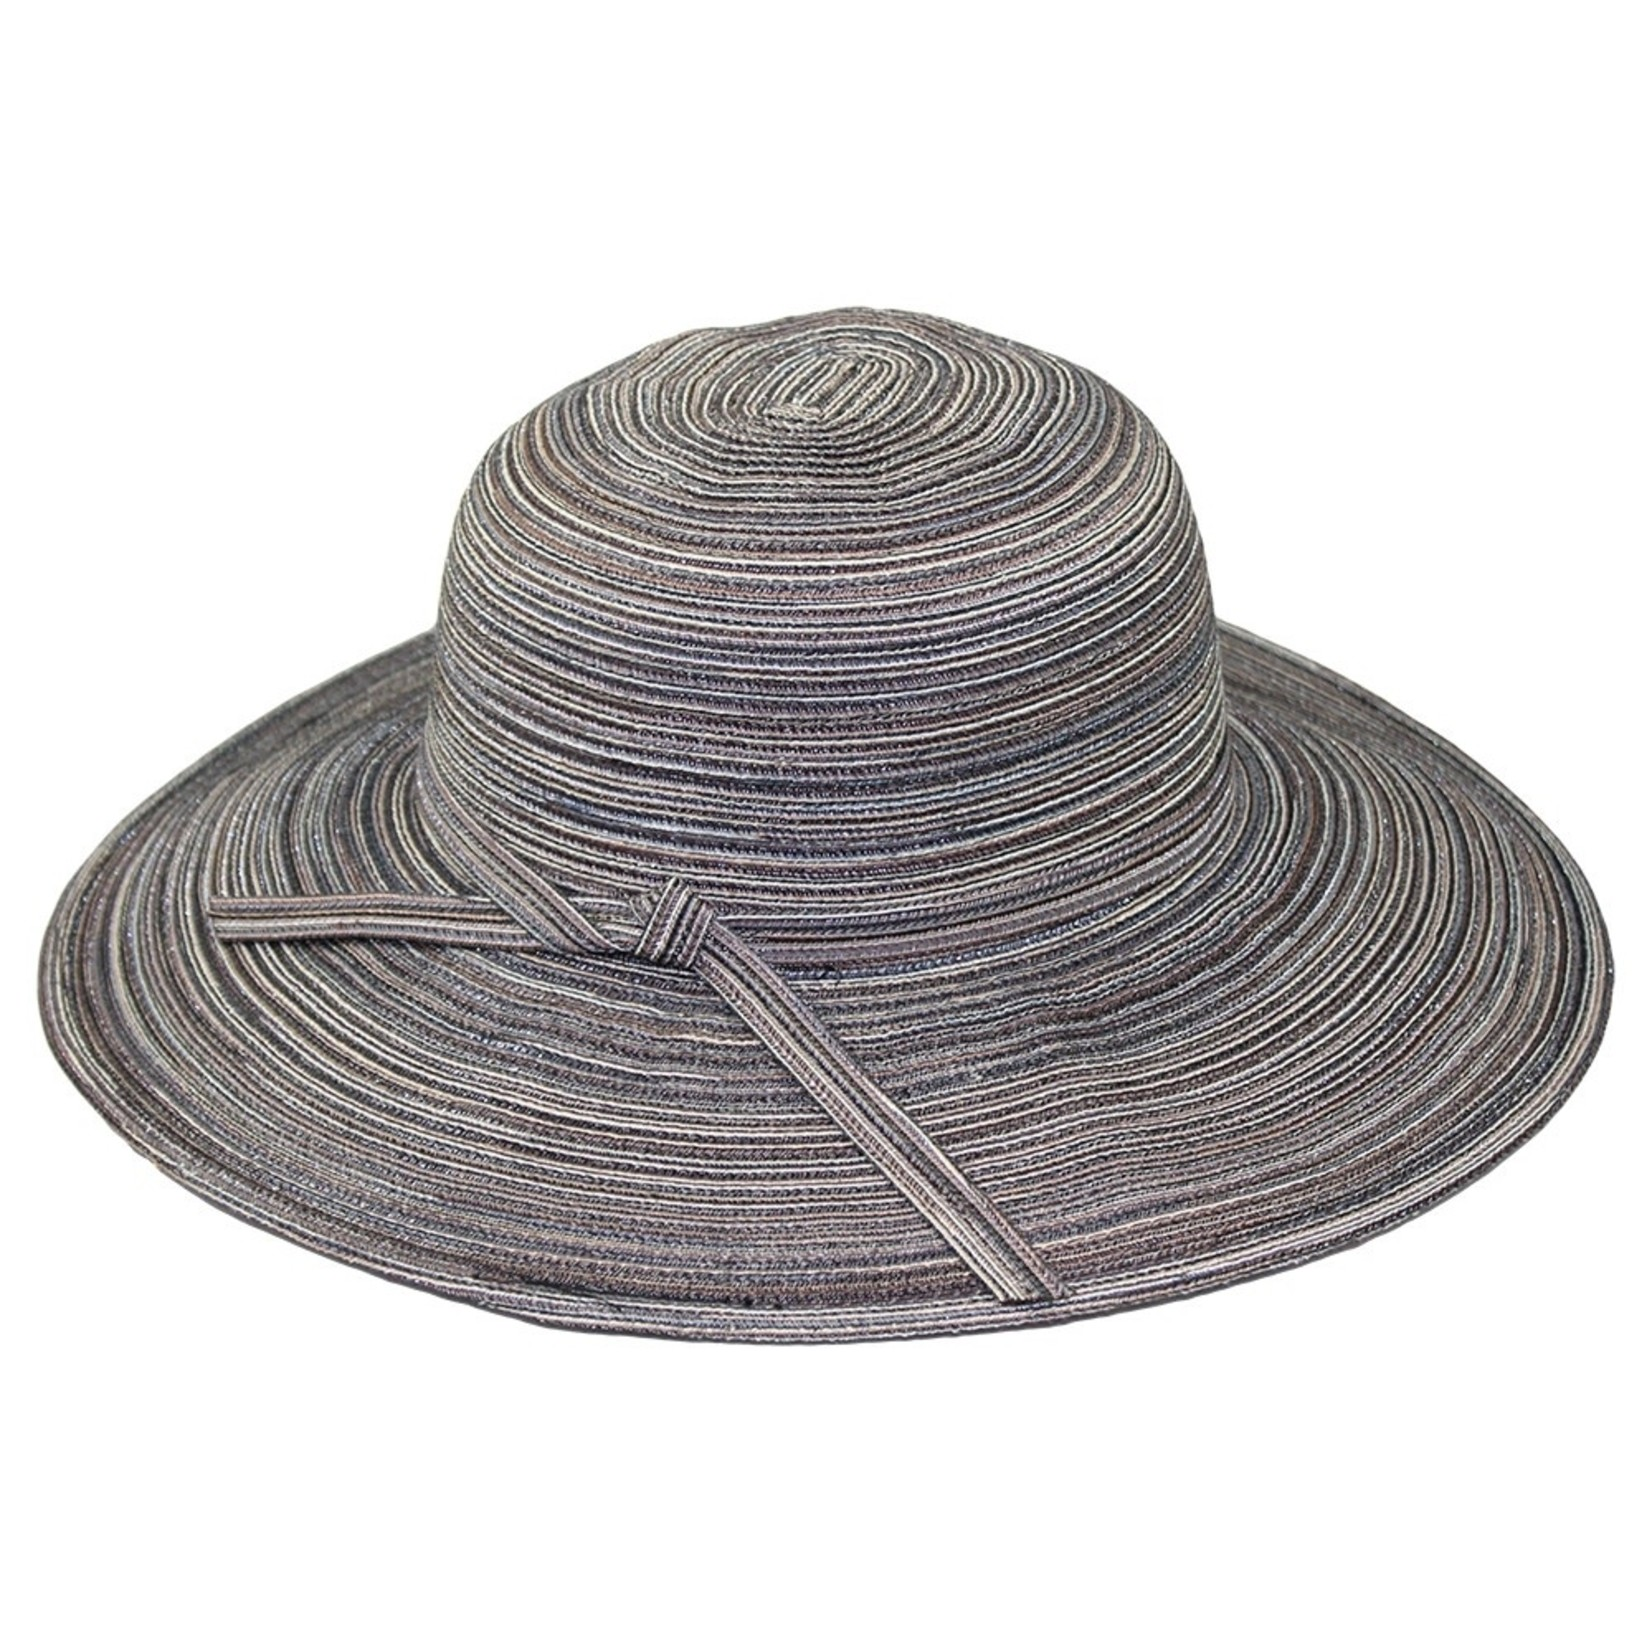 Jeanne Simmons Black Mix Flat Brim Hat